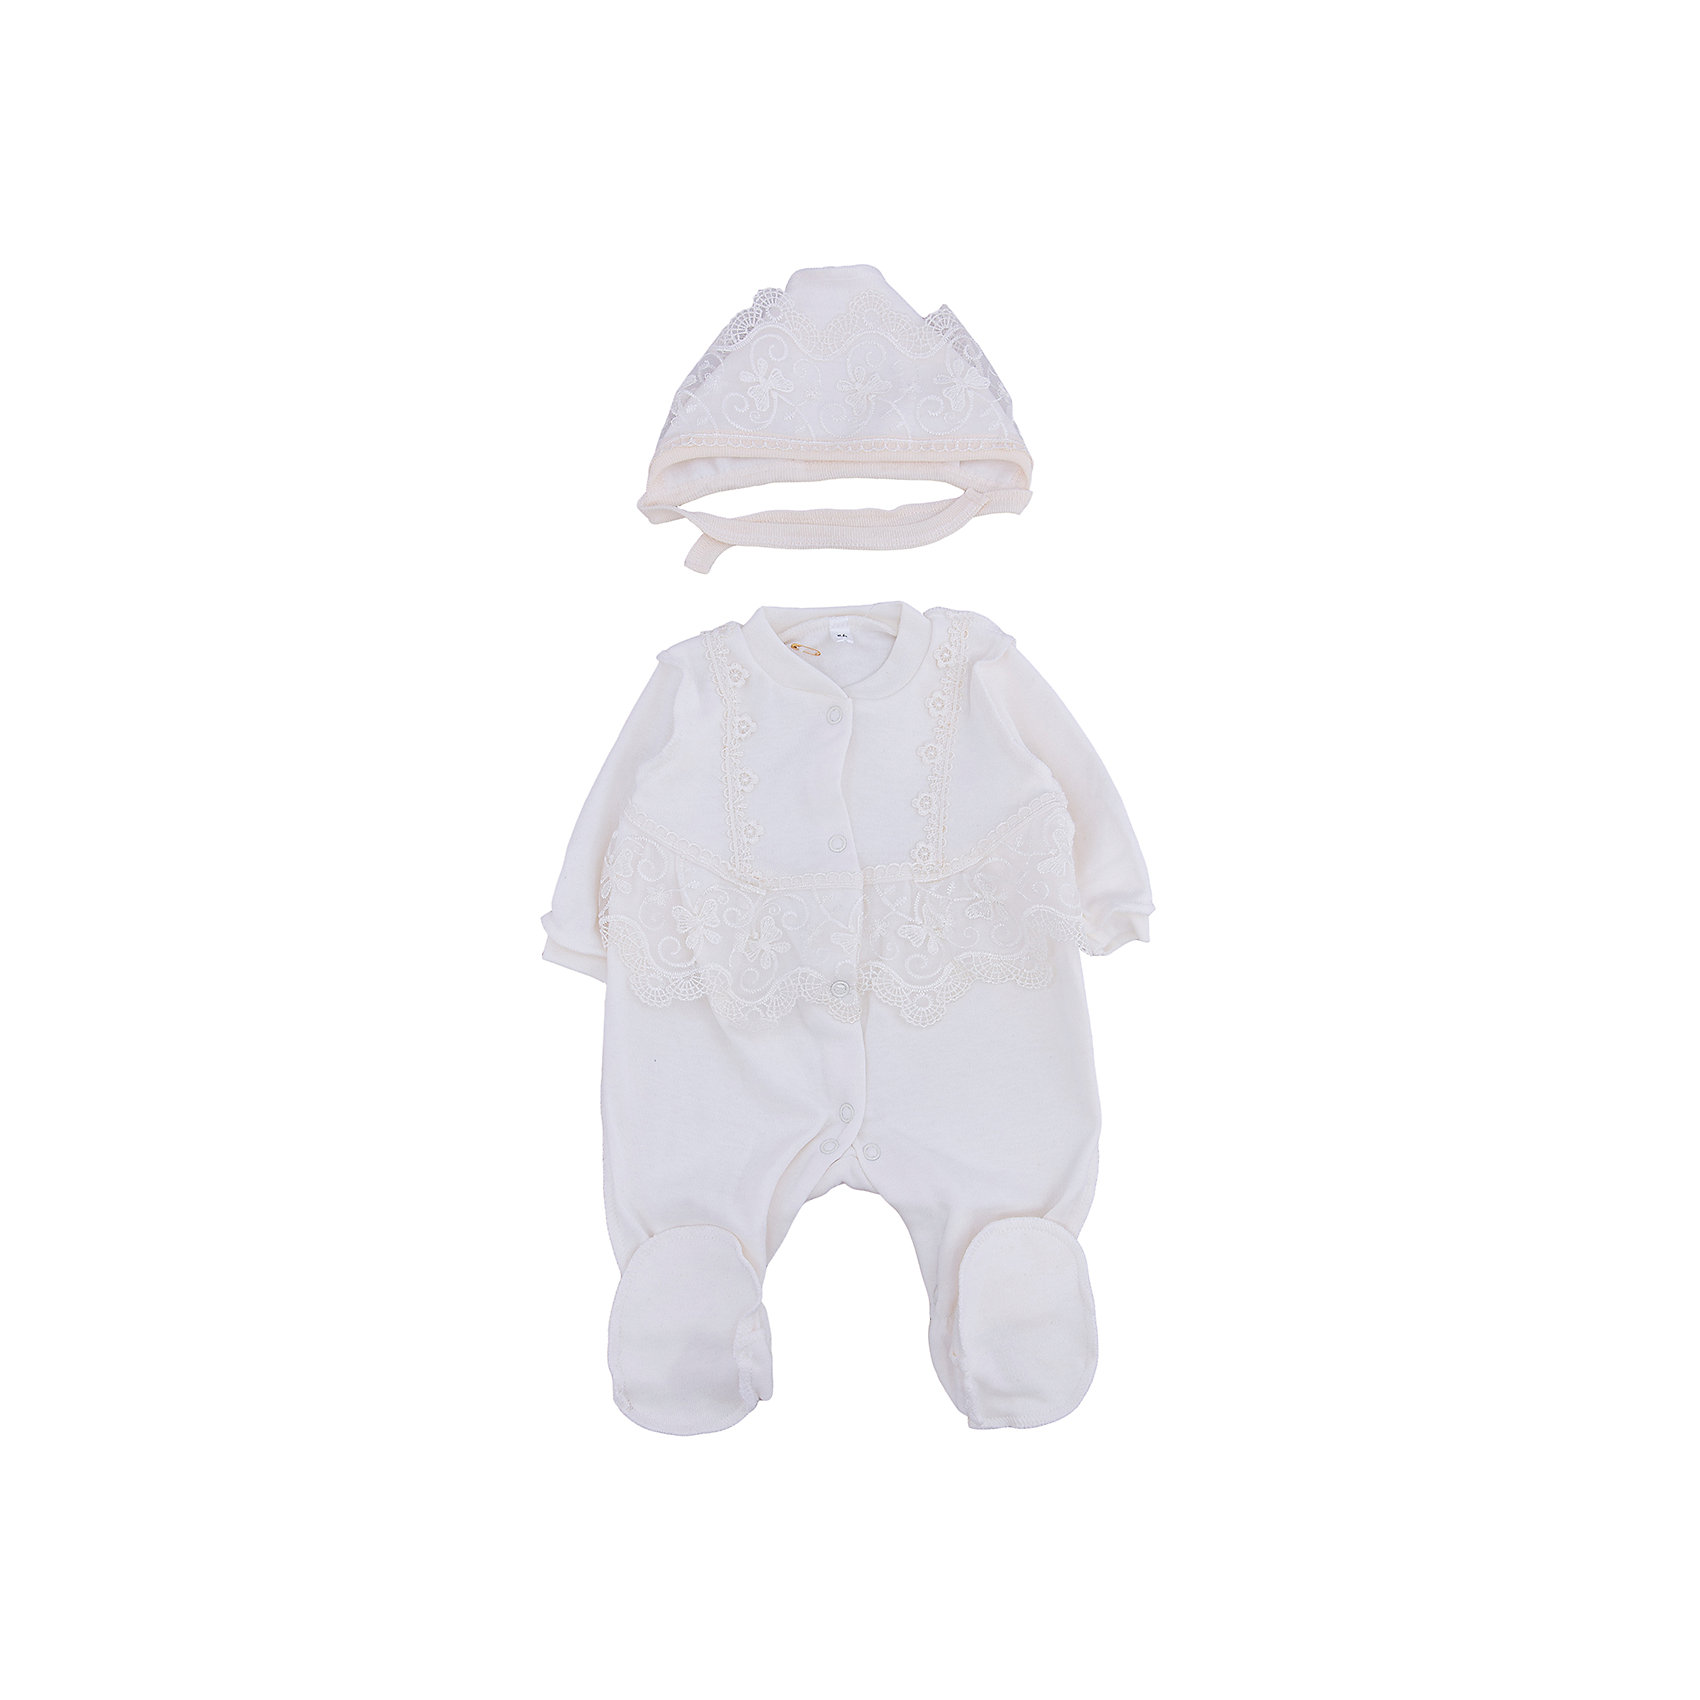 Soni Kids Комплект на выписку для девочки Soni Kids комплект для девочки 5161oz0a10p01 синий beba kids